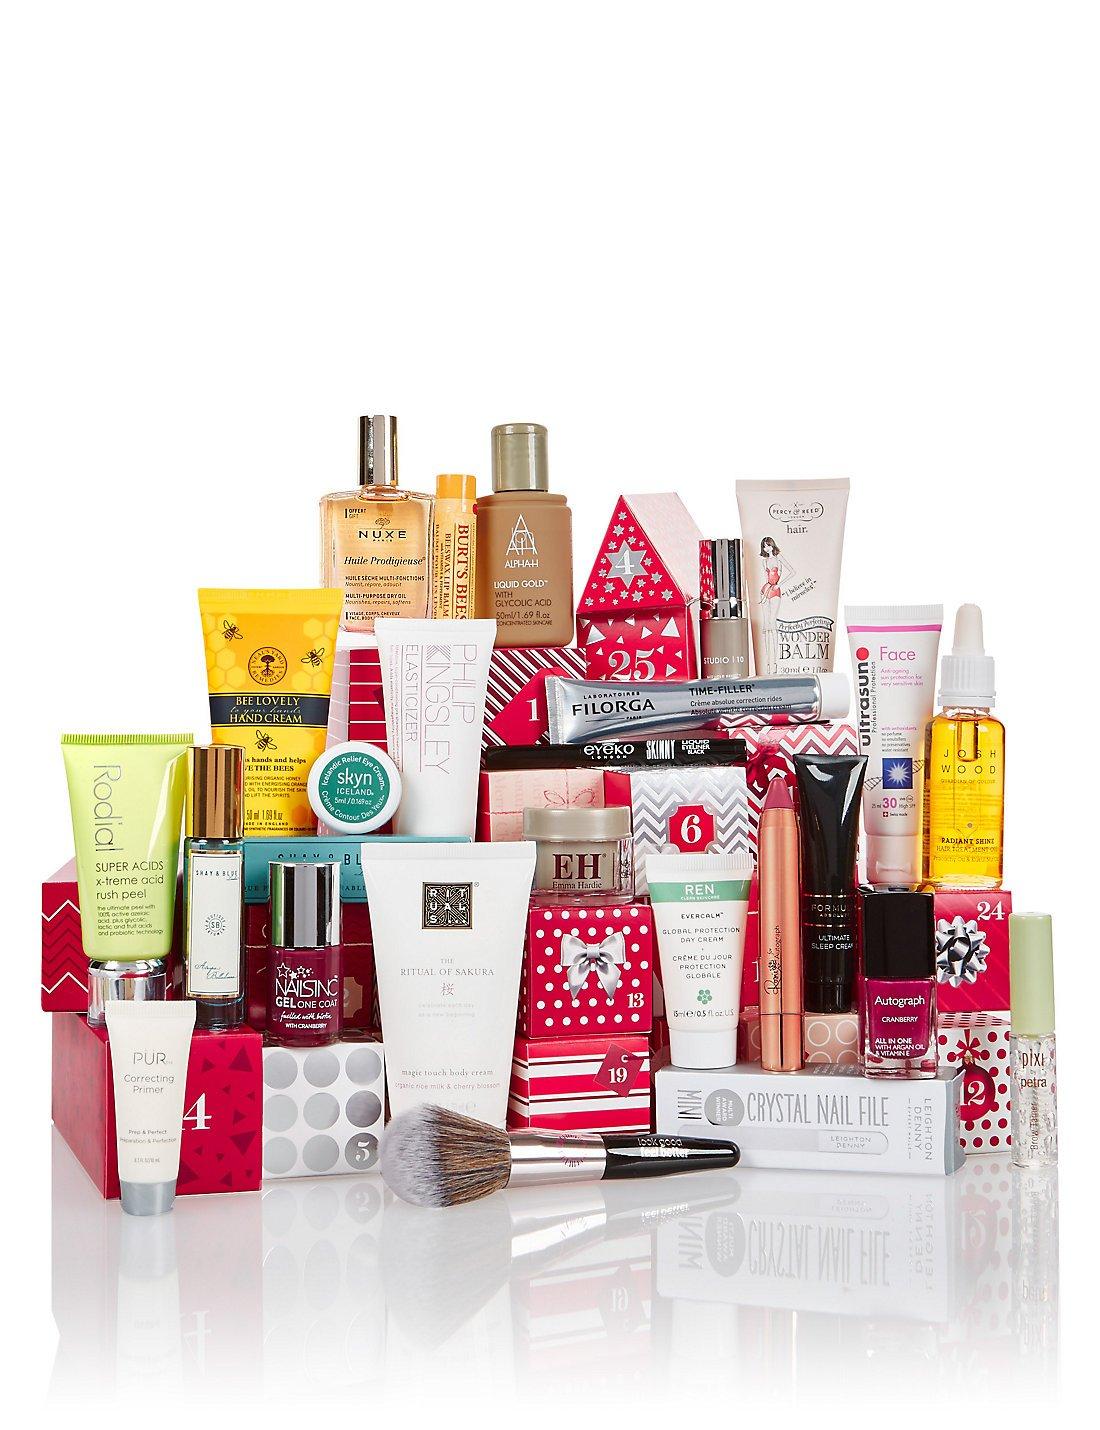 M&s Beauty Advent Calendar – £35 When You Spend £35+ | 2019 Diy How M&s Advent Calendar 2019